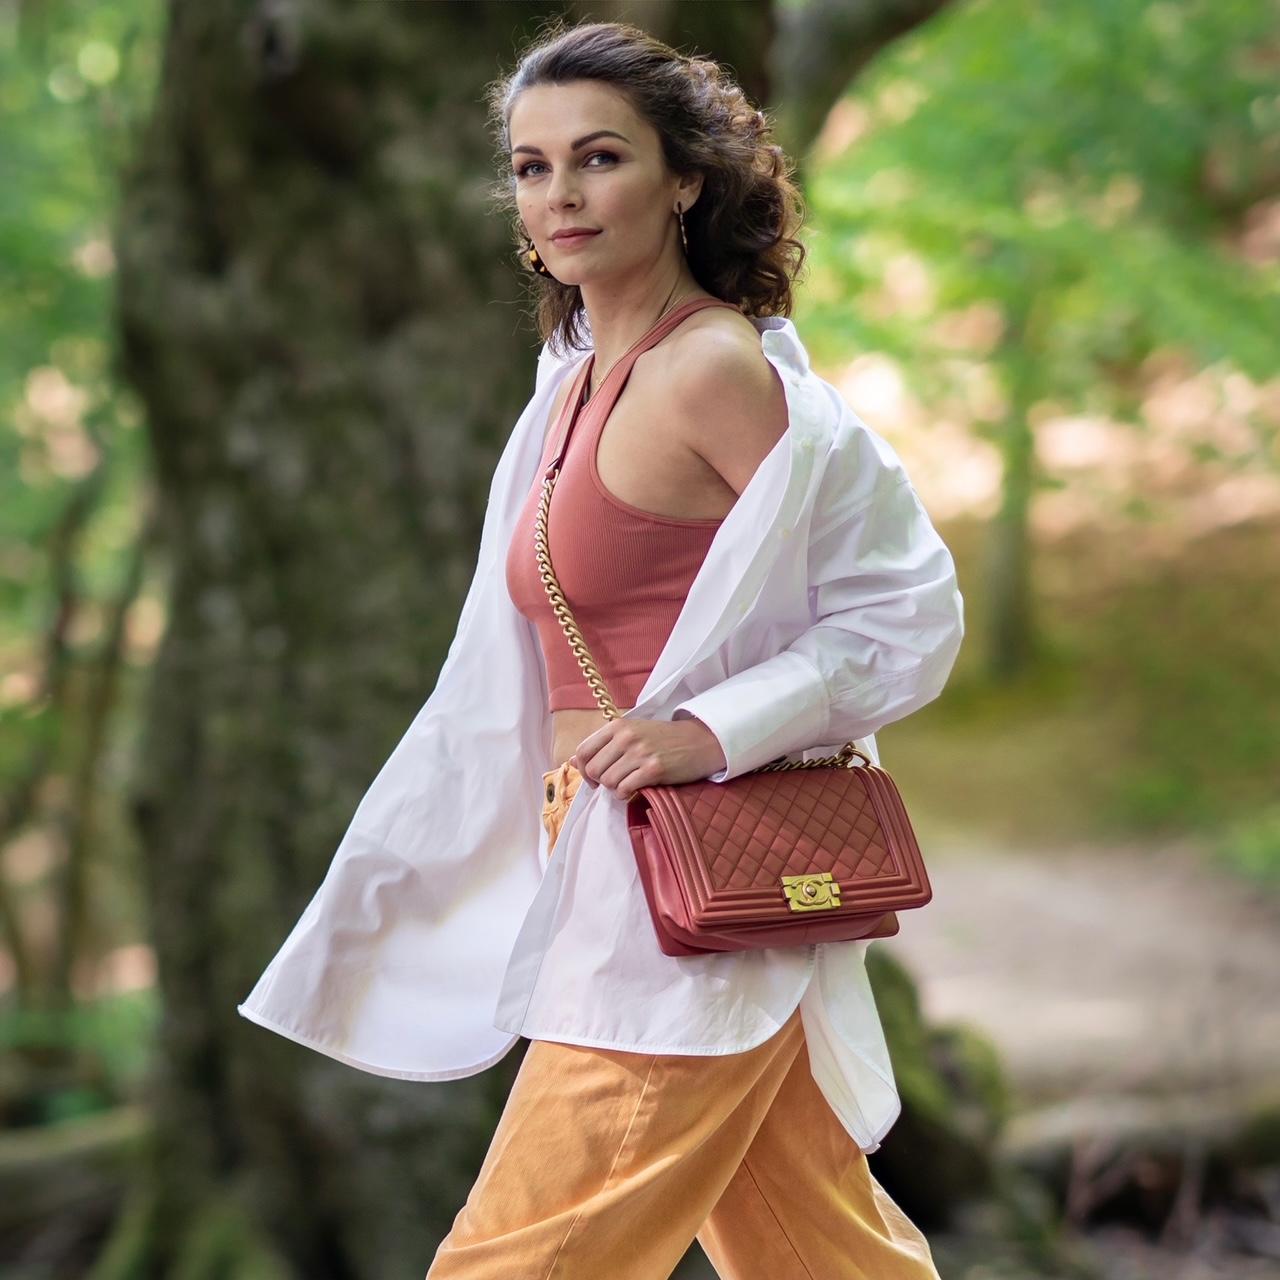 Girl walking with Chanel bag